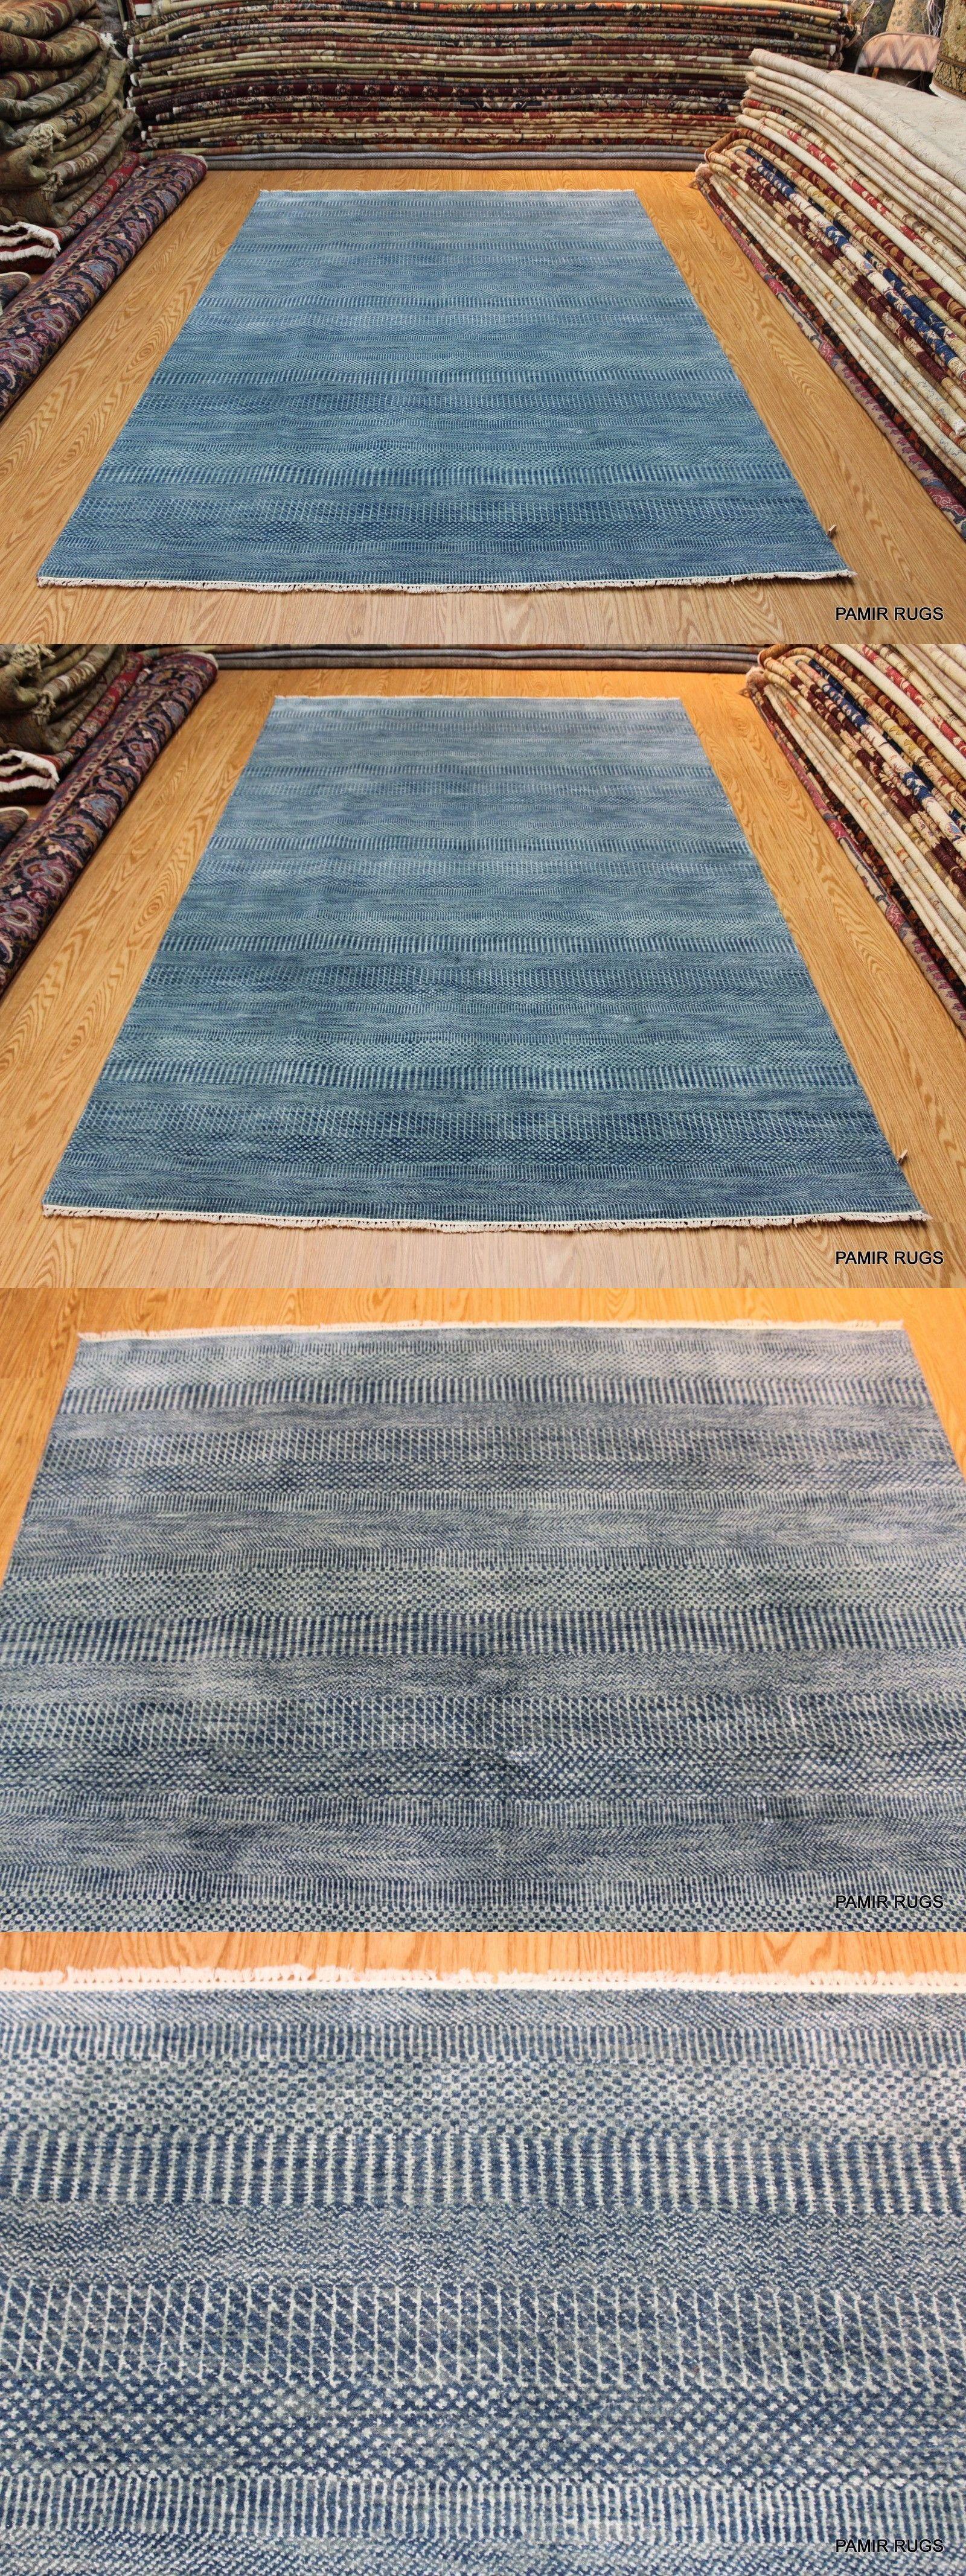 6 X 9 Handmade Hand Knotted Fine Quality Light Navy Blue Rug Natural Wool Ebay Navy Blue Rug Blue Rug Rugs